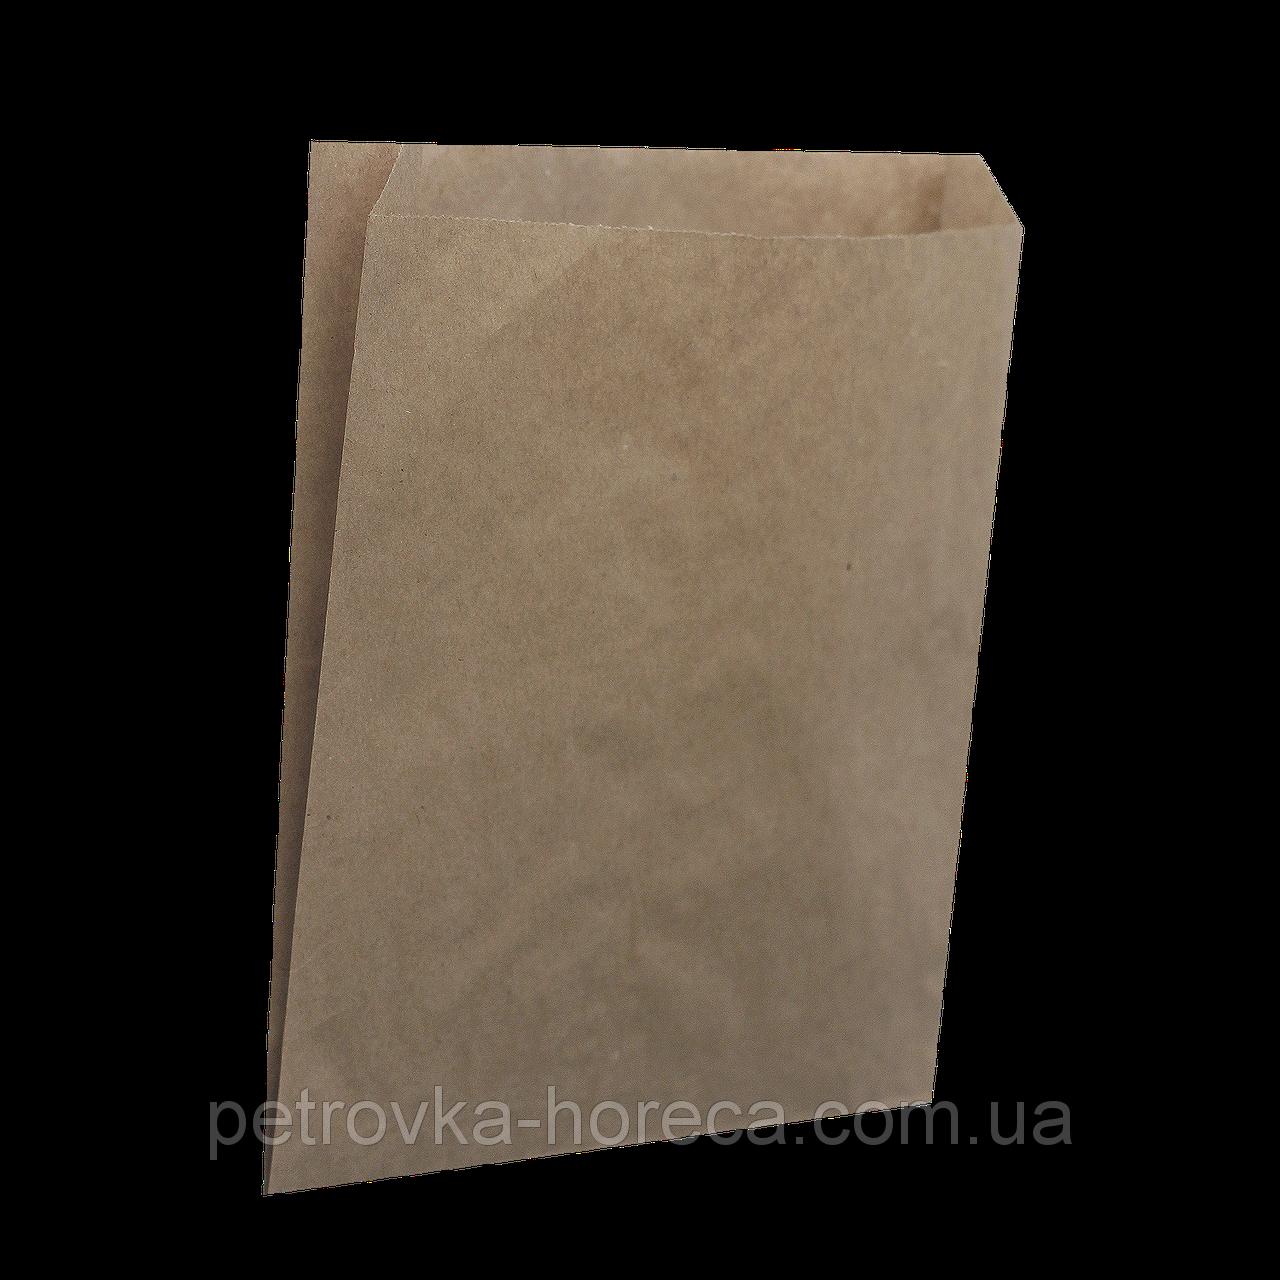 Пакет паперовий  220*140*50 100шт  Крафт (602)